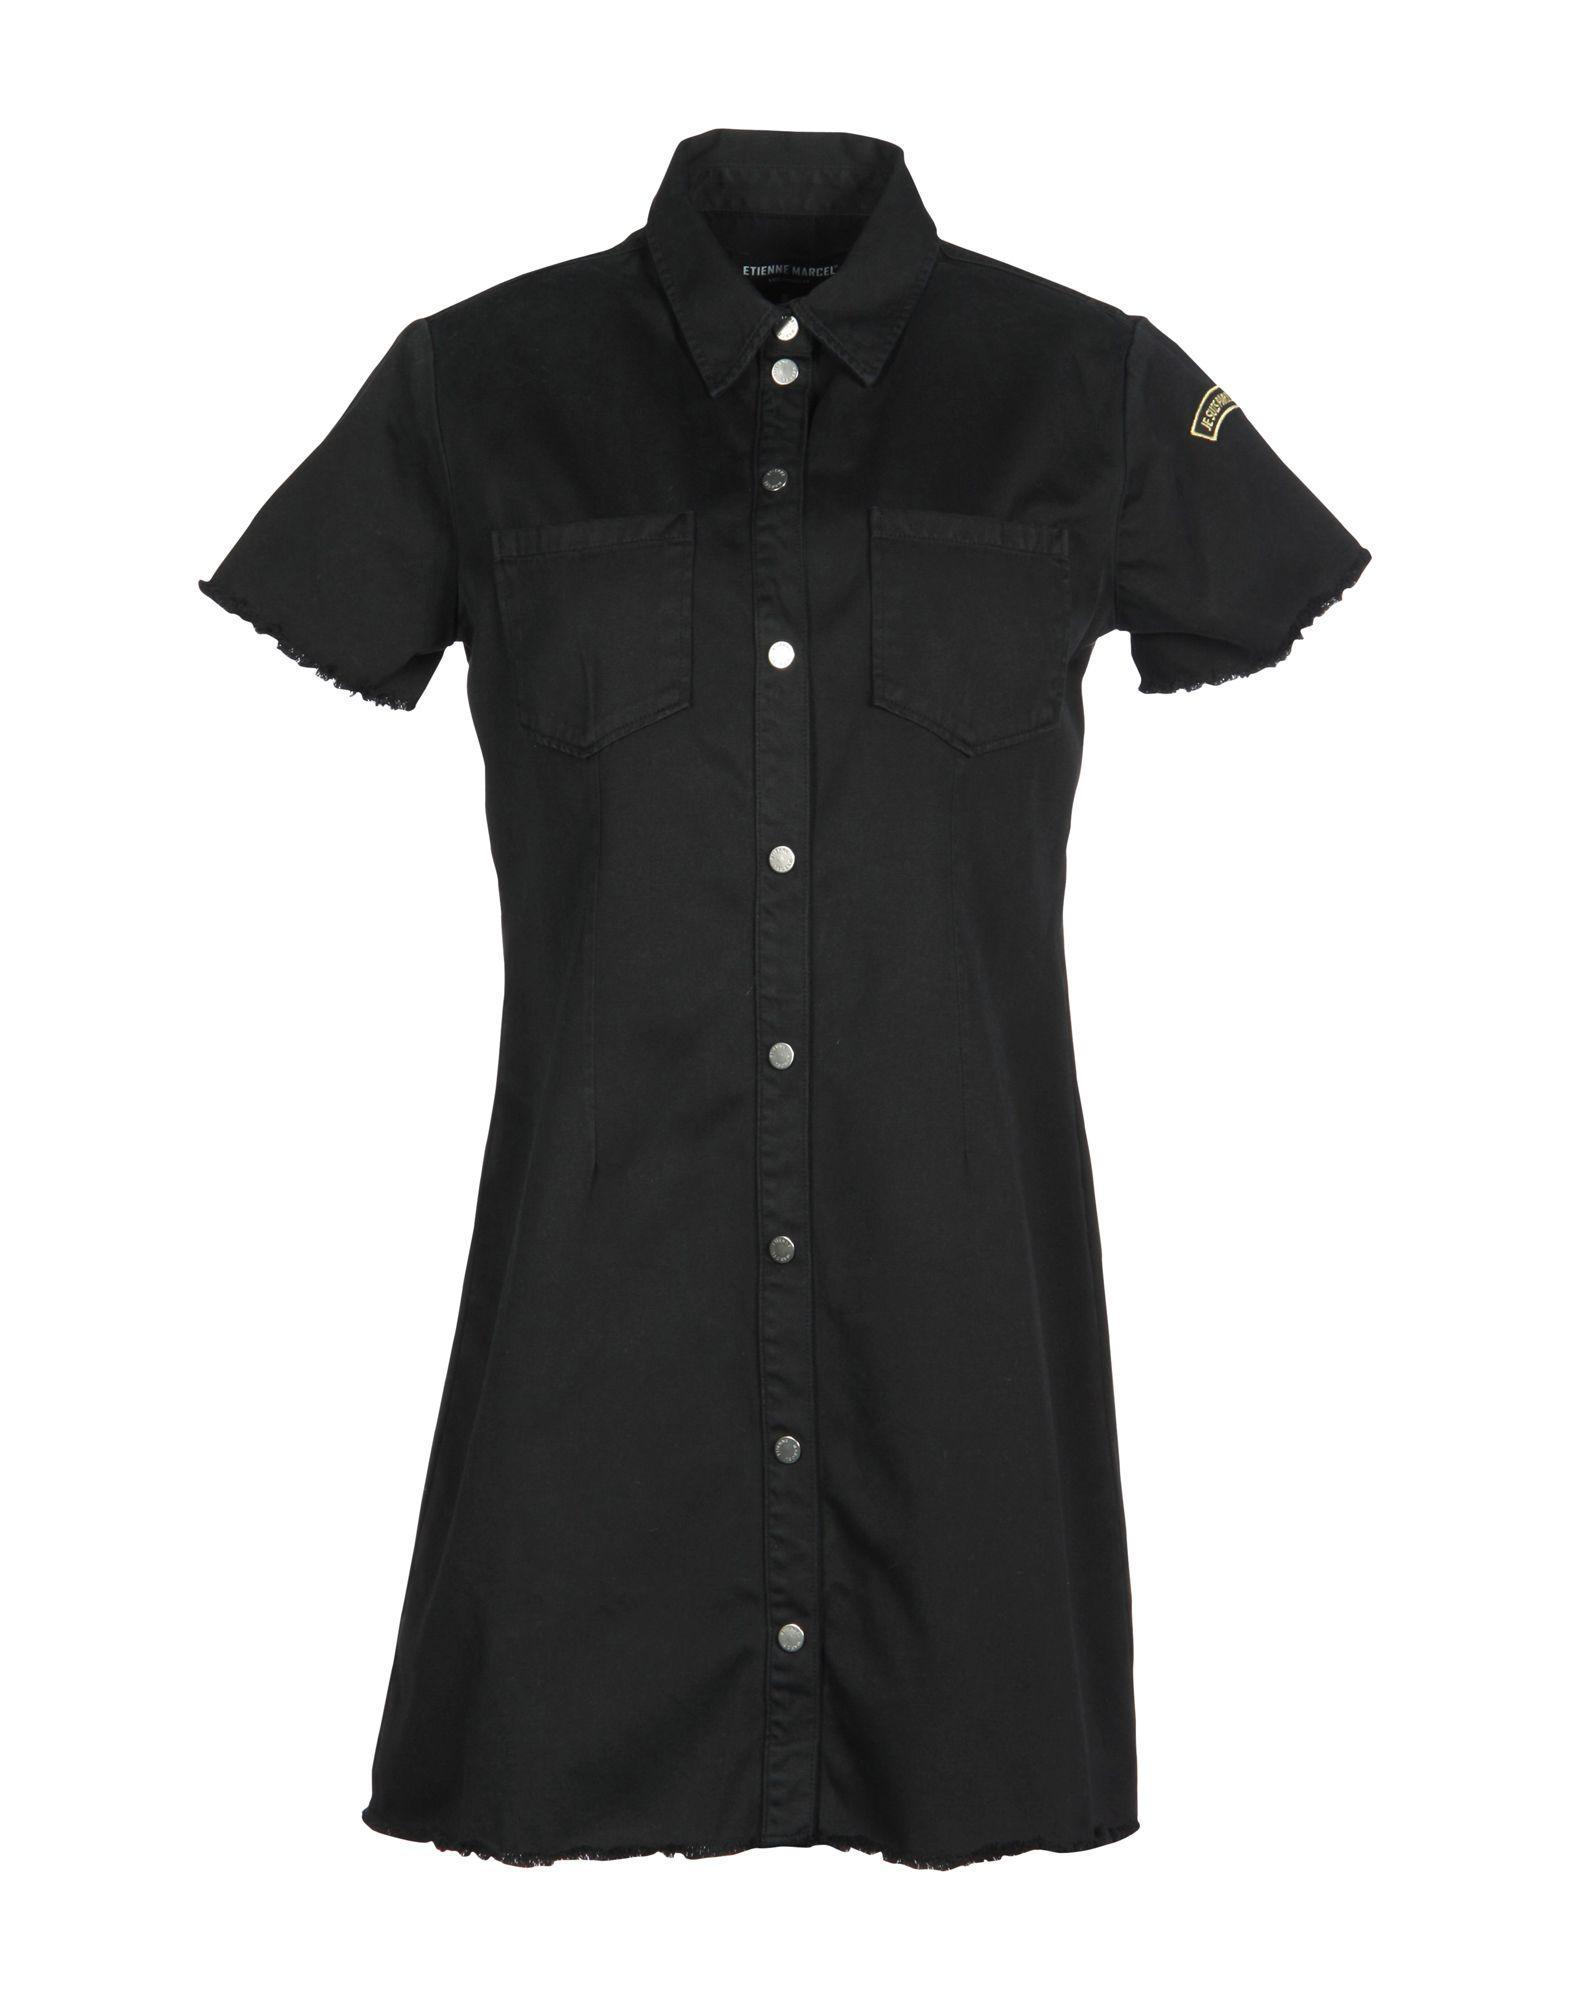 Etienne Marcel Short Dress In Black